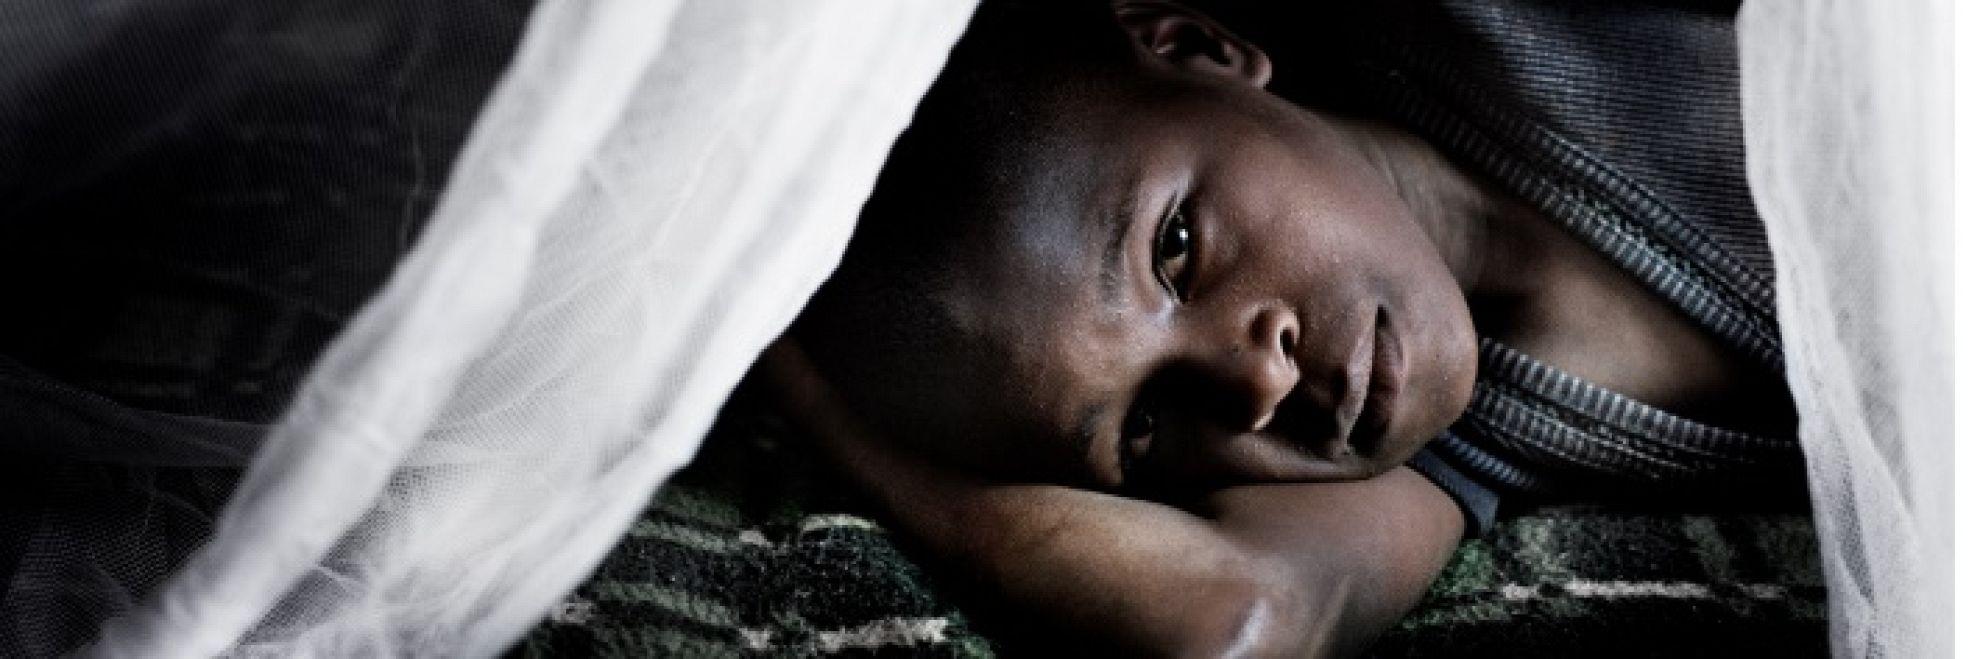 Latest News Malaria consortium launches exhibition to mark world malaria day